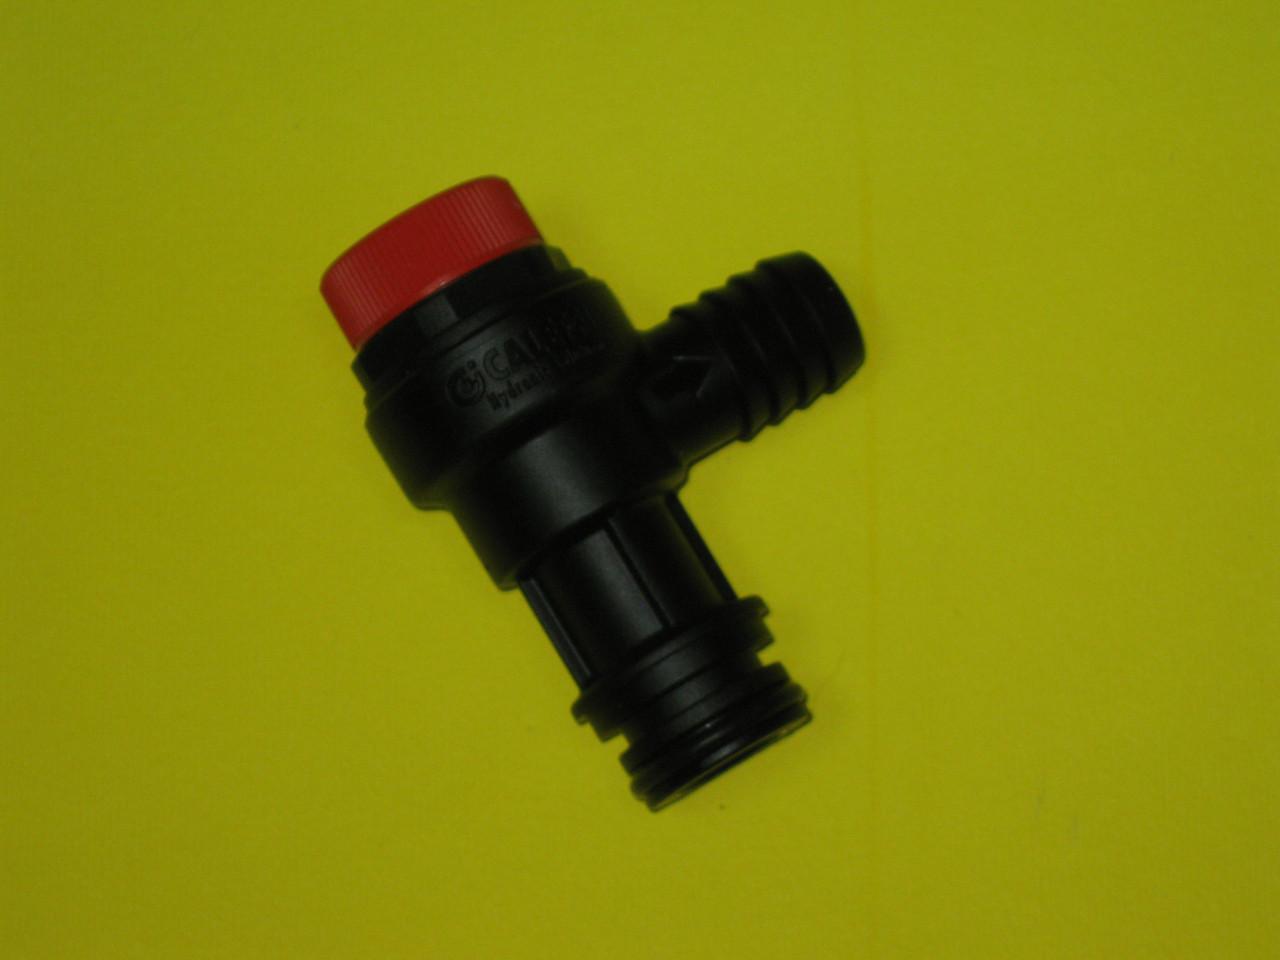 Предохранительный клапан 3 бар (клапан безопасности) Immergas Star 24 3E, Mini 24 3E